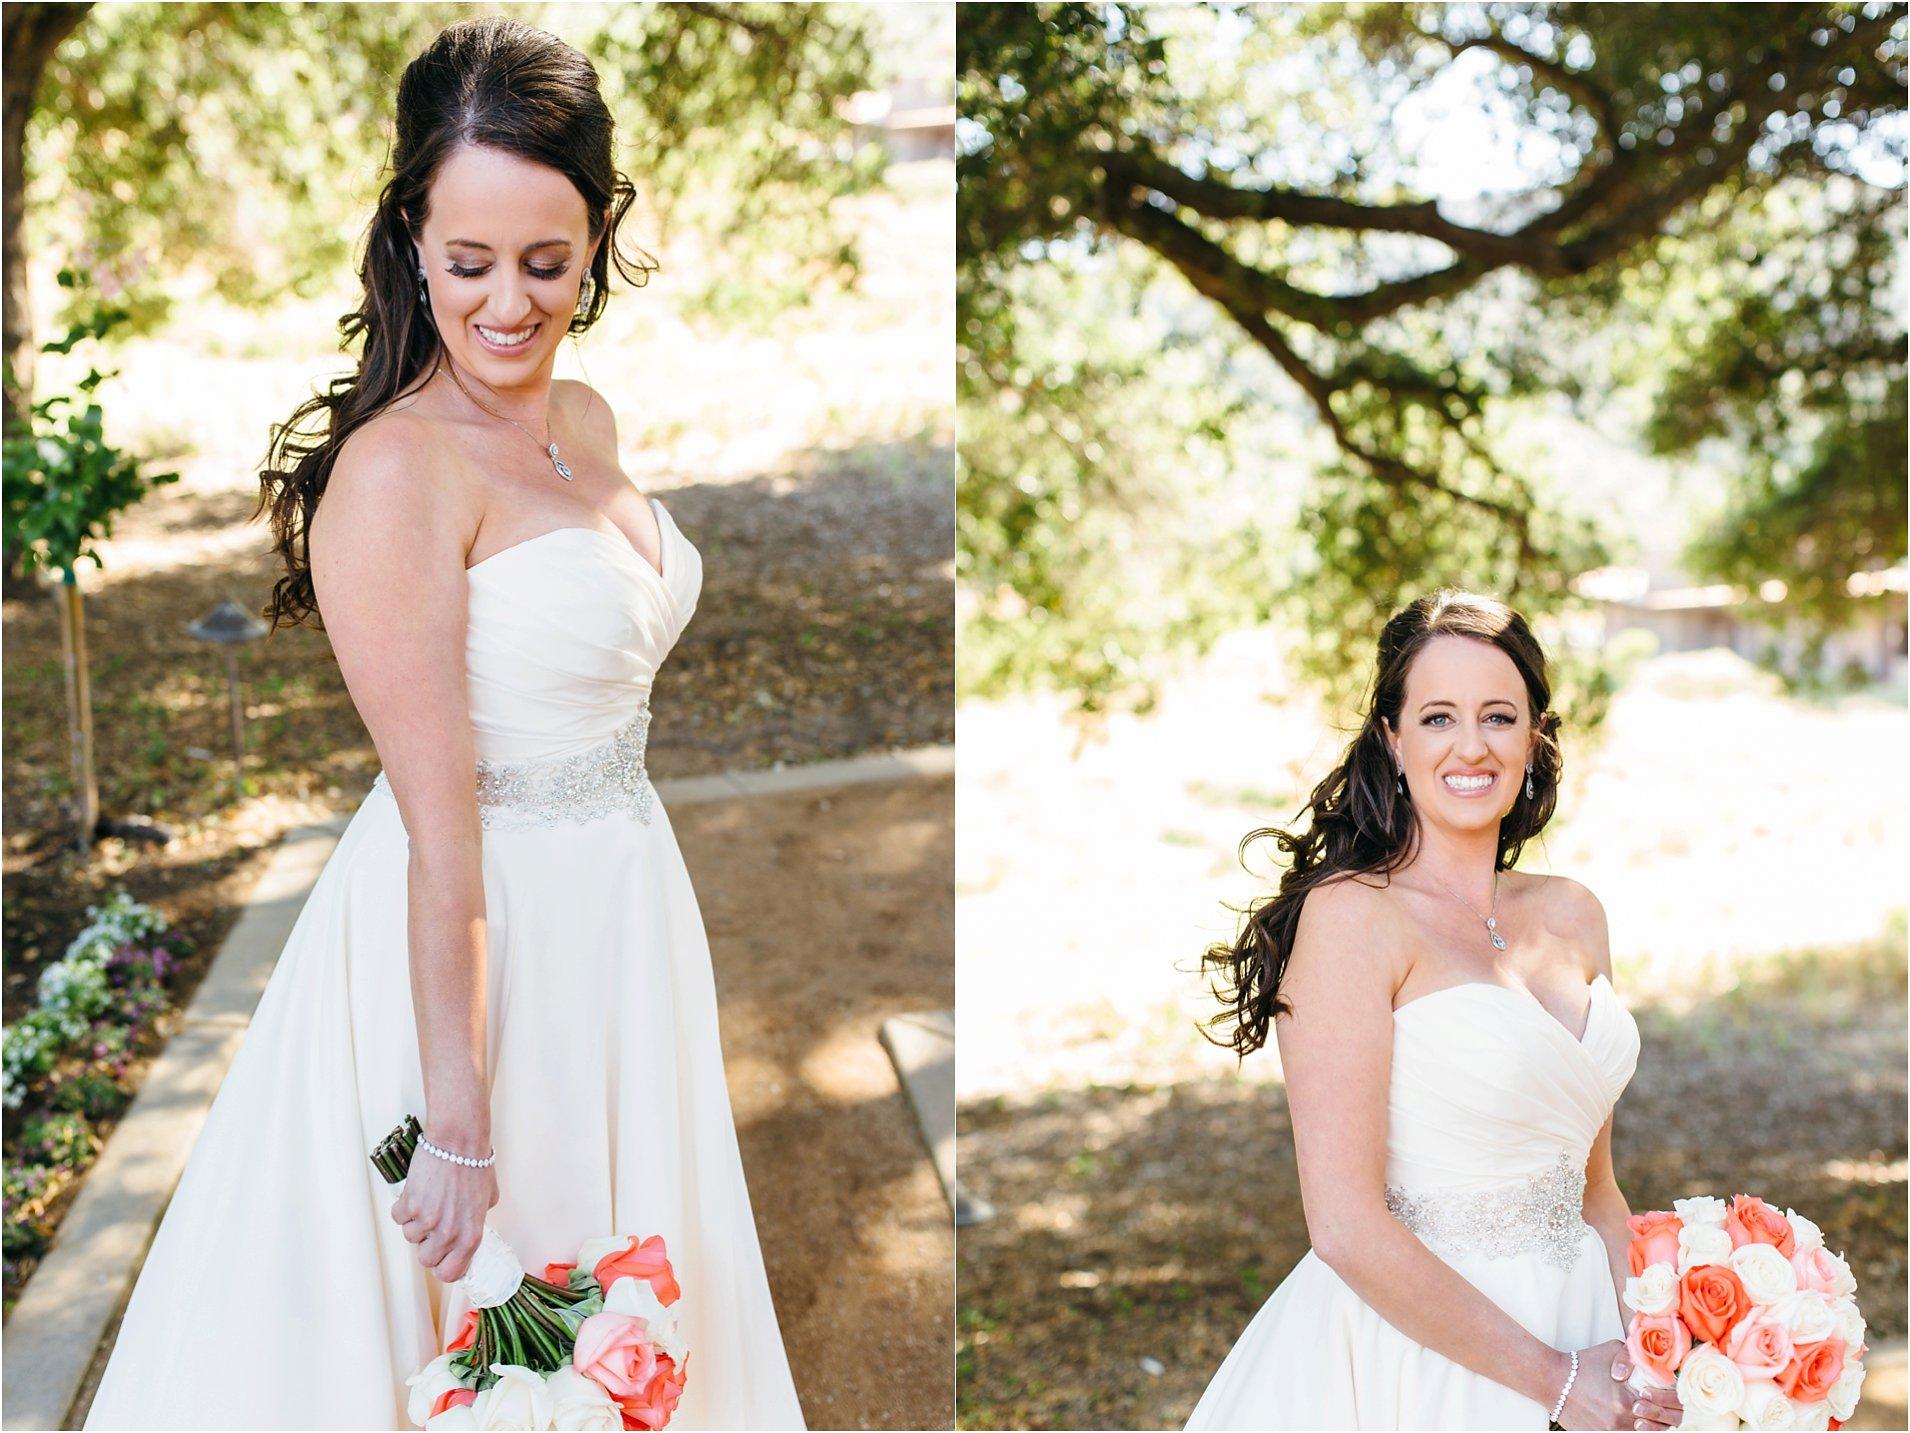 bridal photos at pechanga